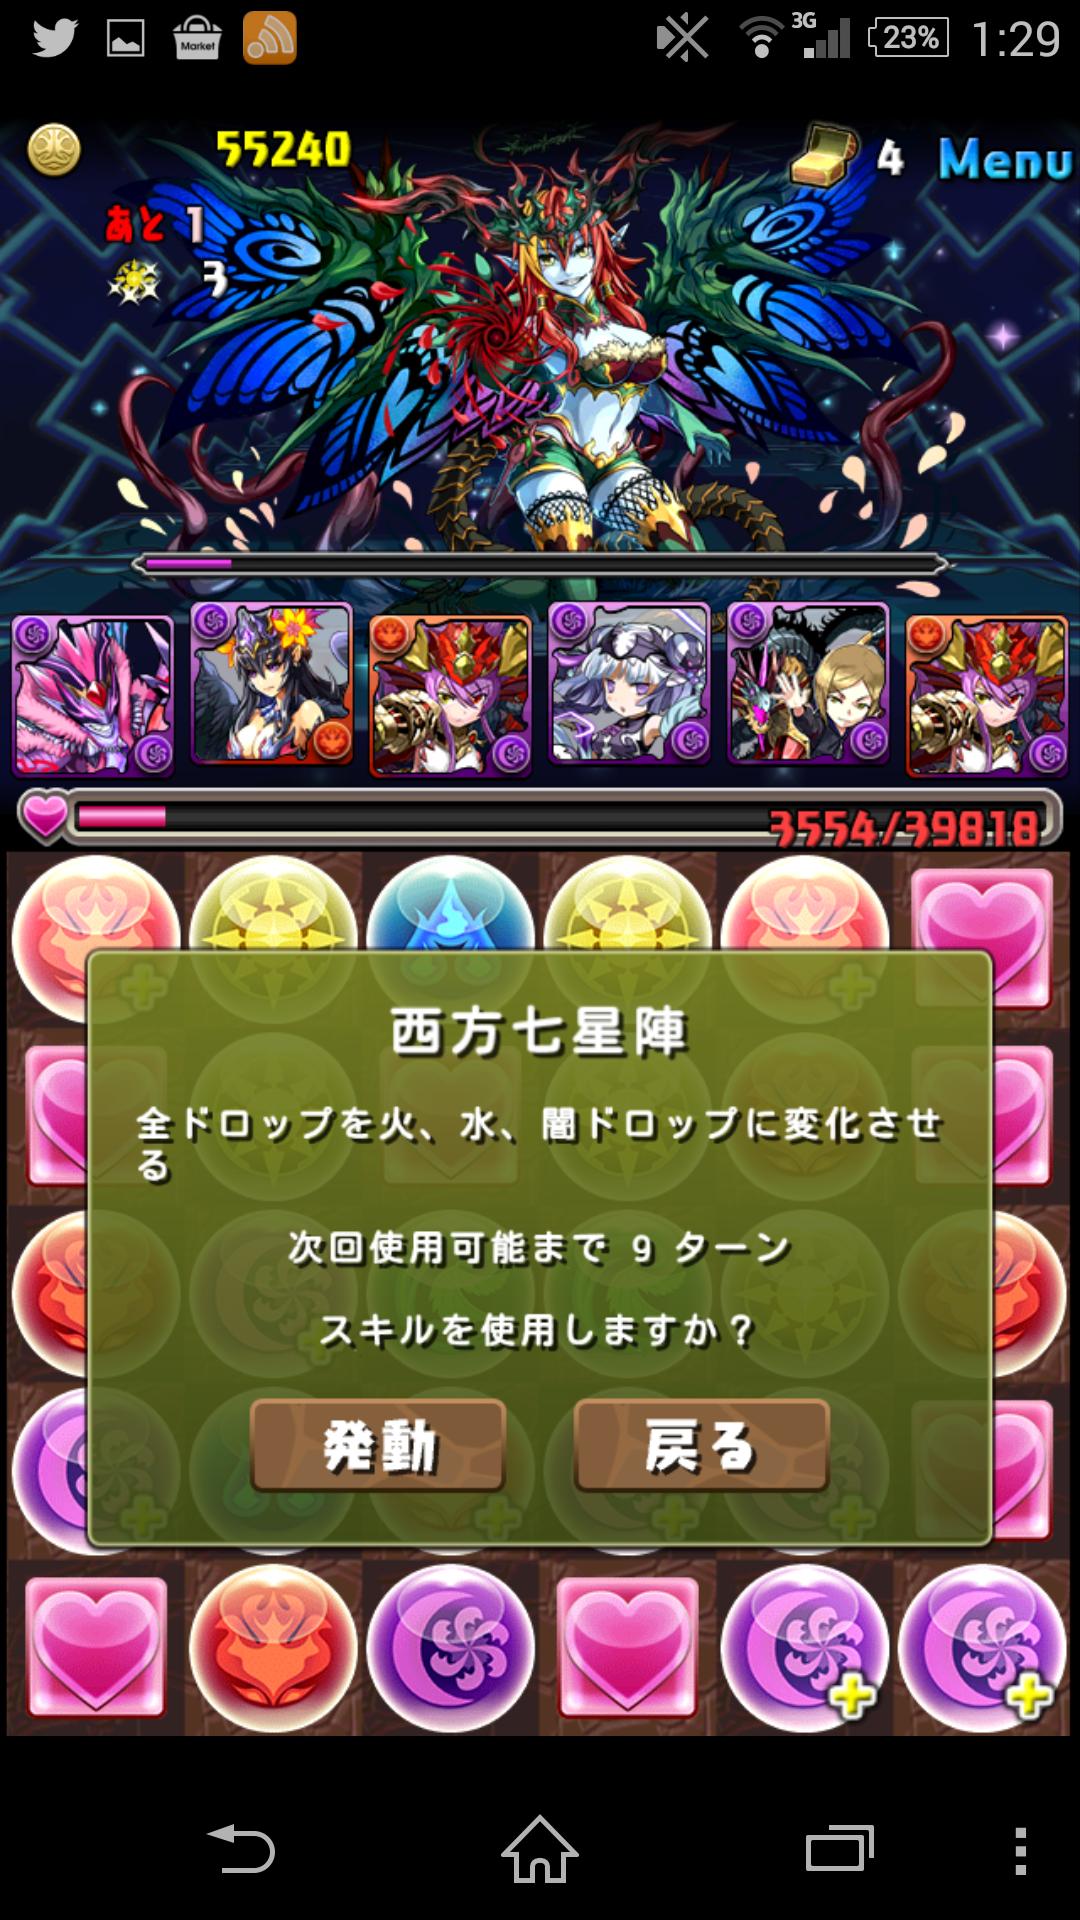 Screenshot_2014-12-19-01-29-48.png